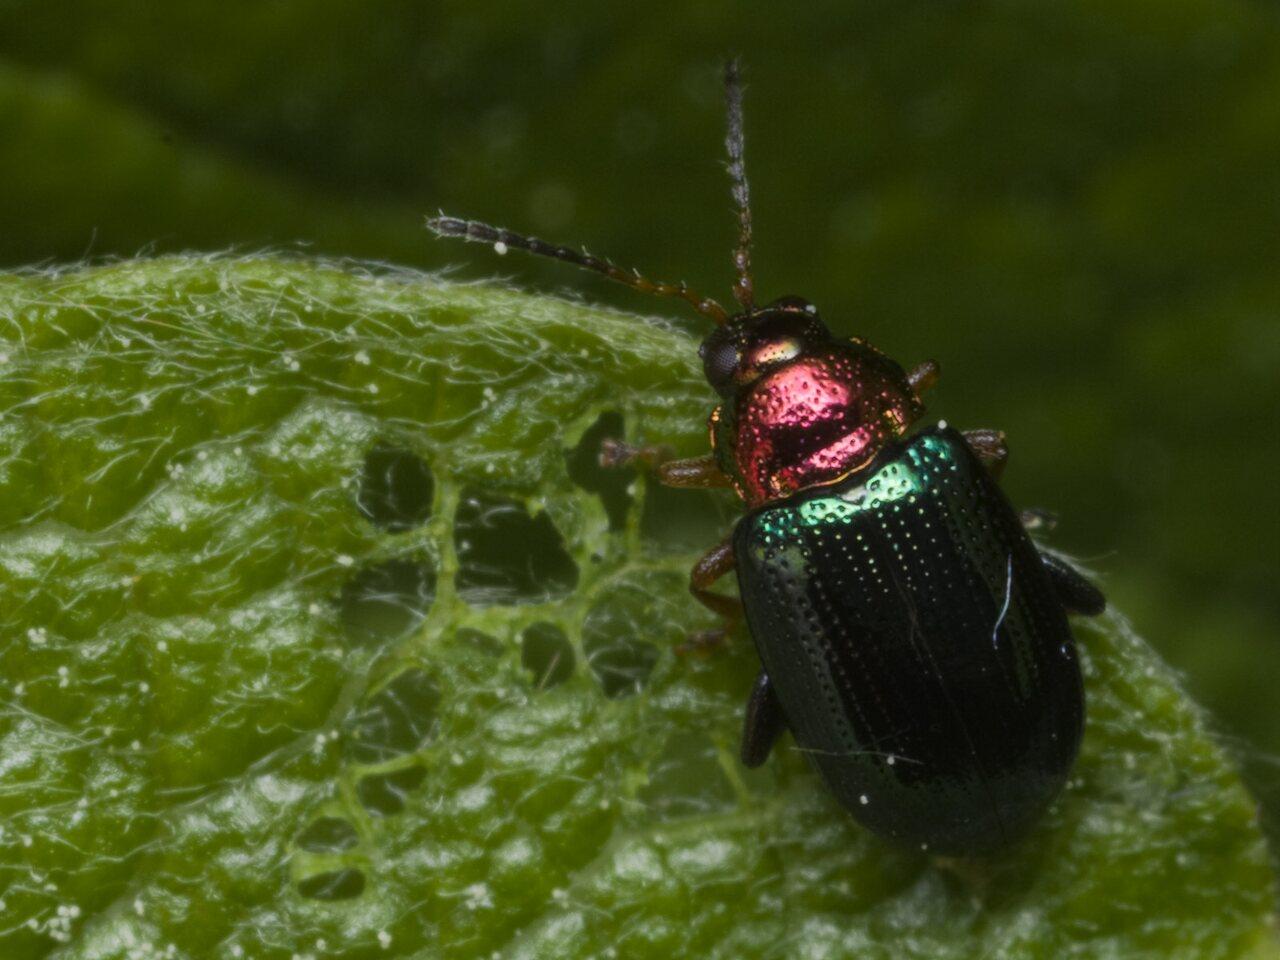 Crepidodera-aurata-1551.jpg